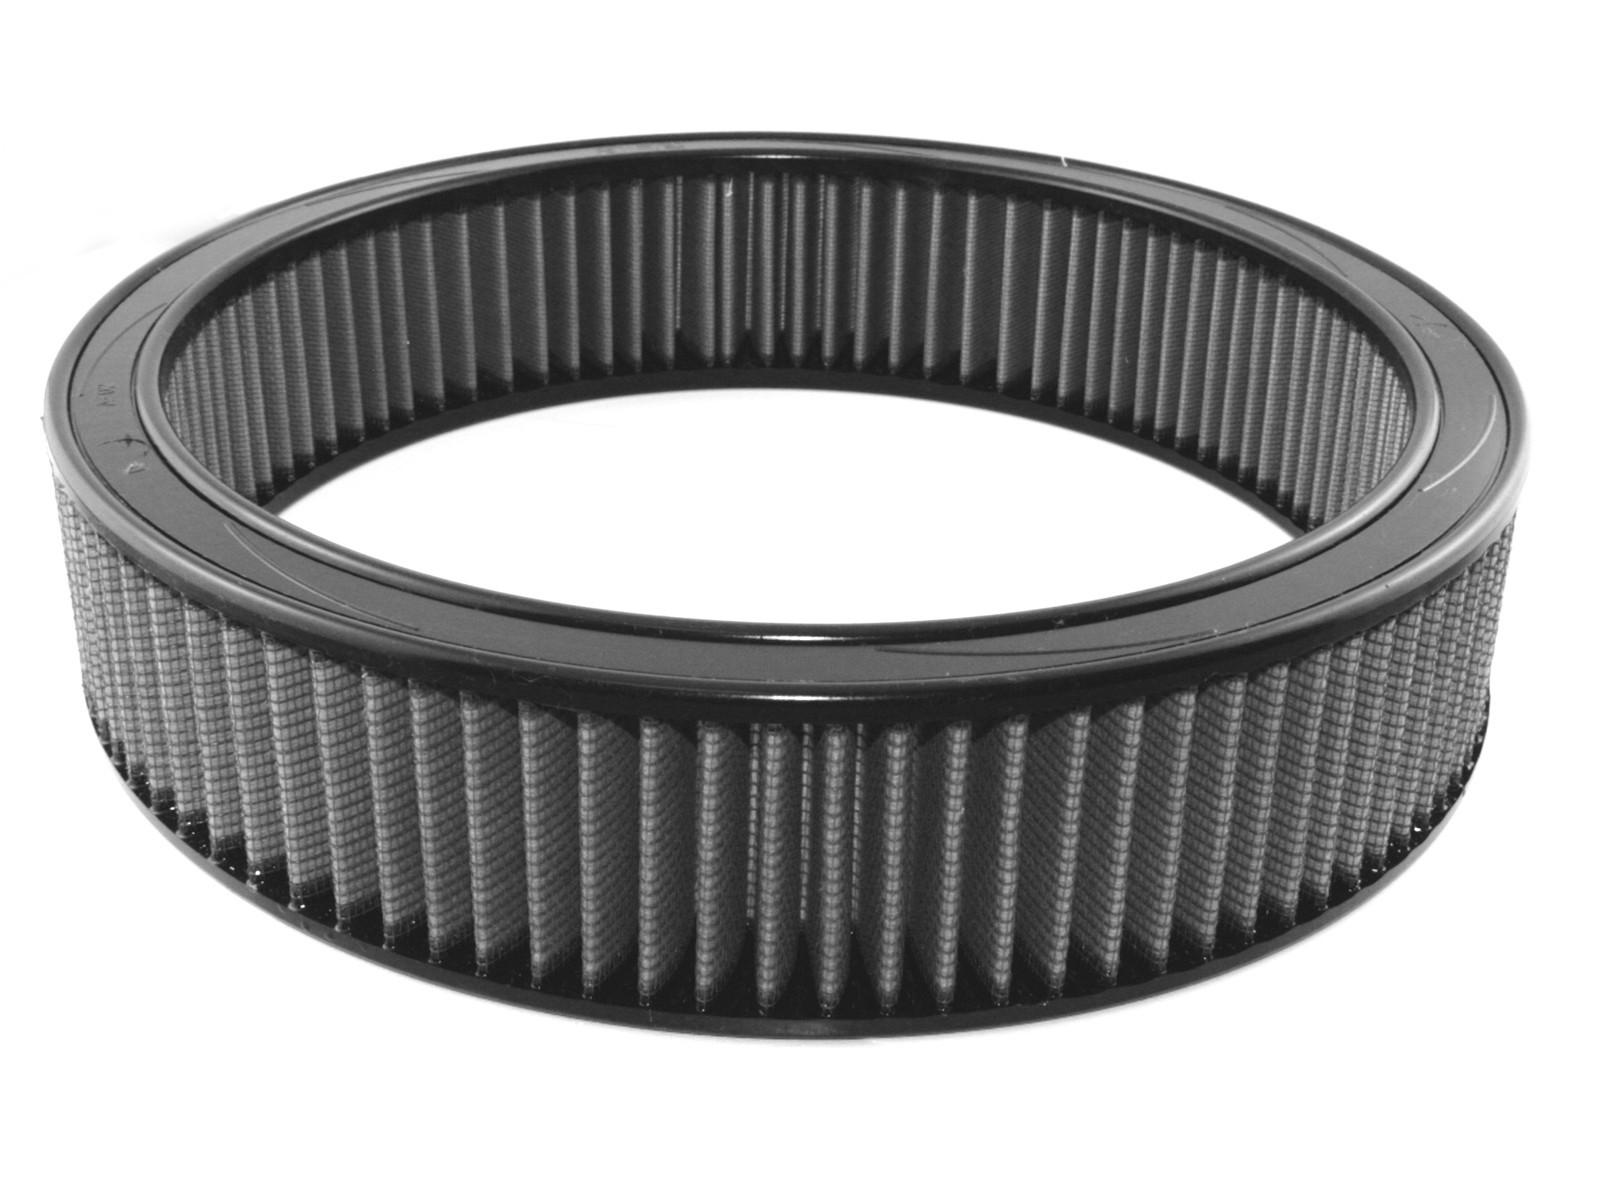 aFe POWER 11-10009 Magnum FLOW Pro DRY S Air Filter